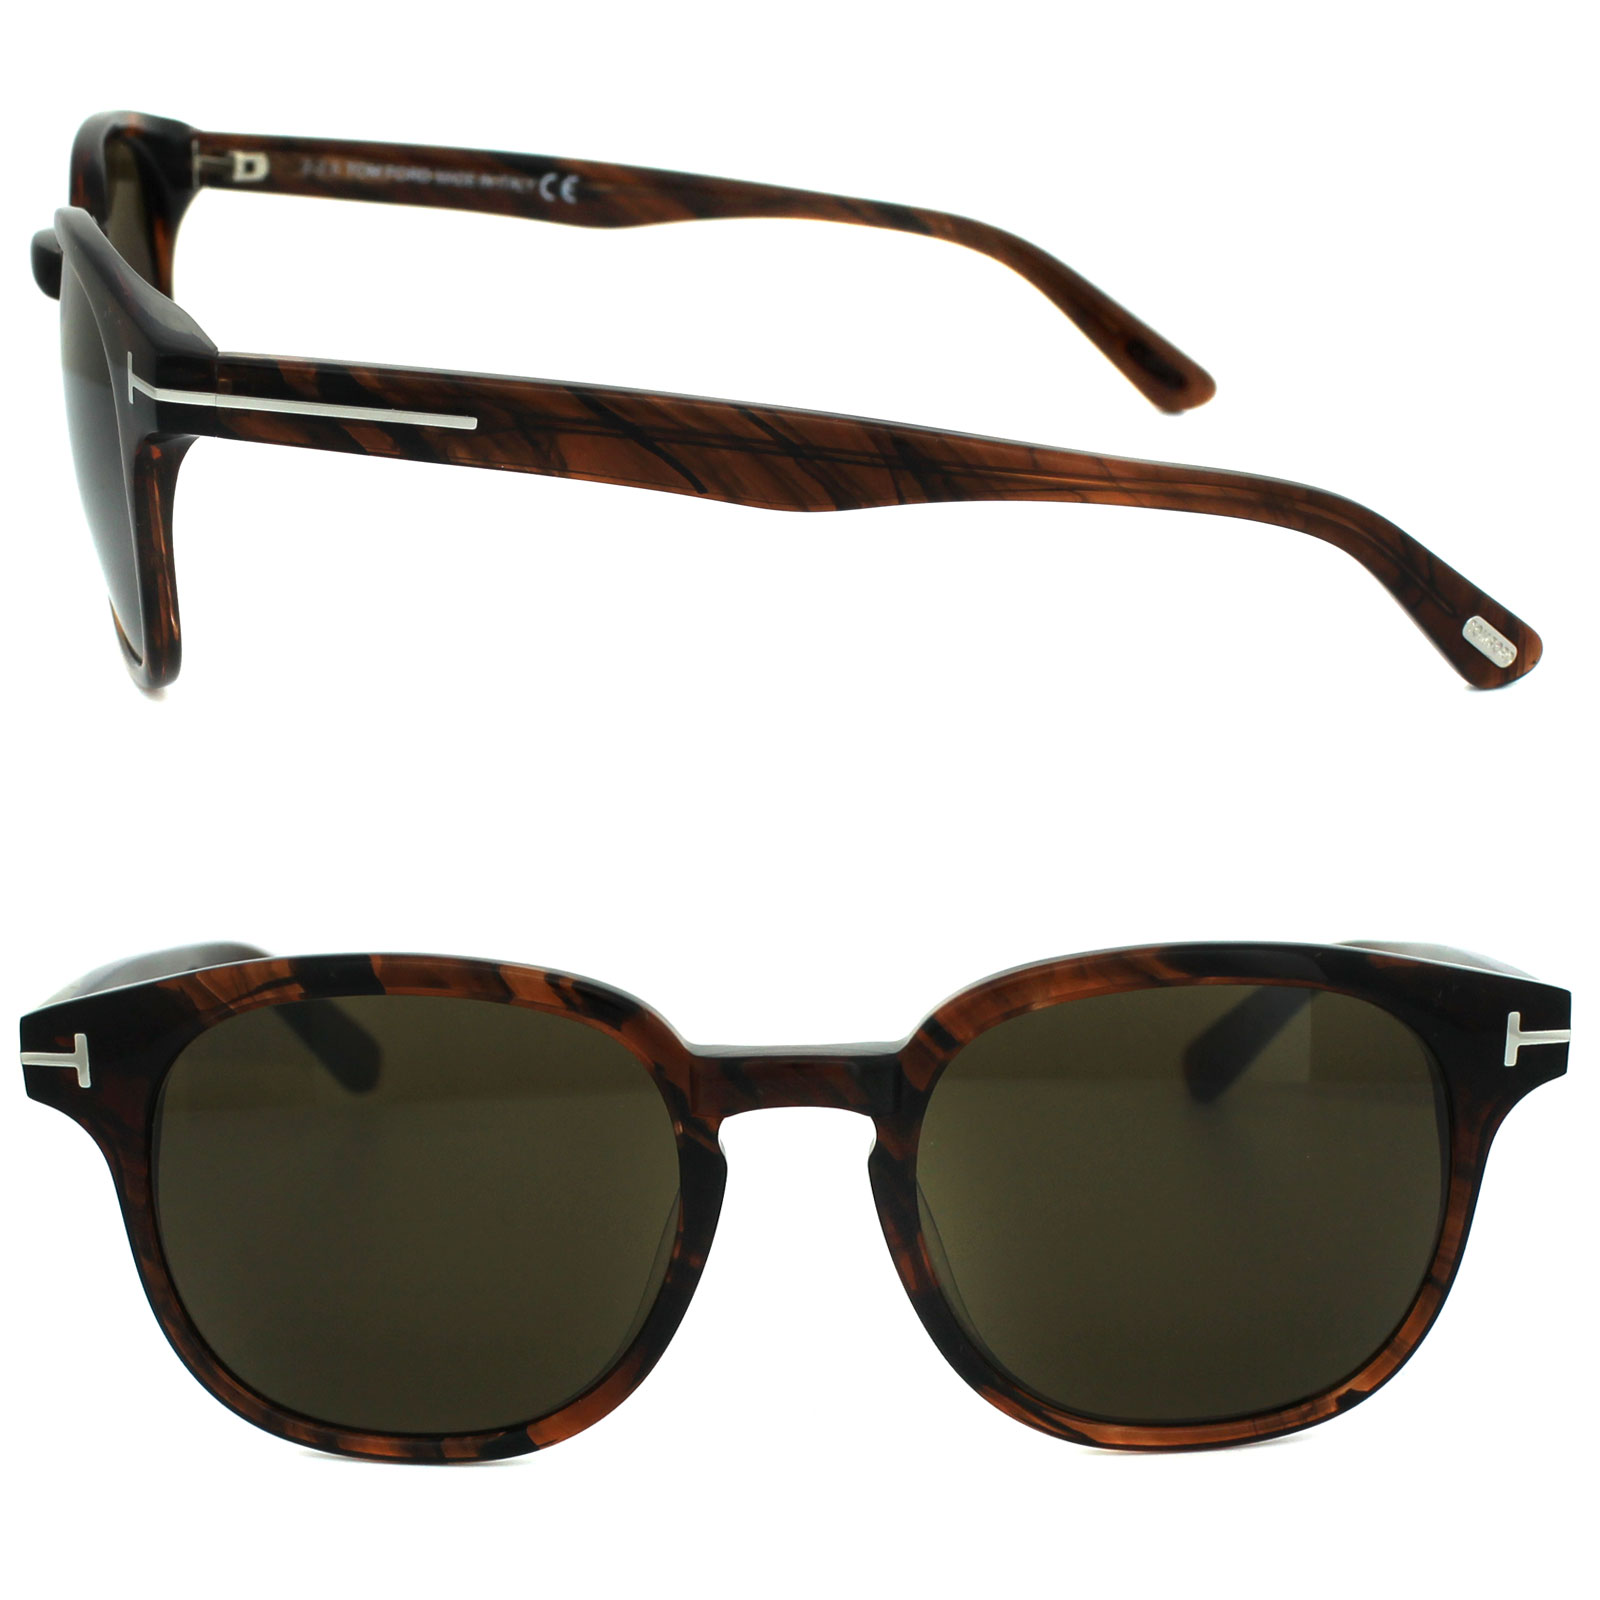 Frameless Glasses Lenscrafters : Tom Ford Sunglasses On